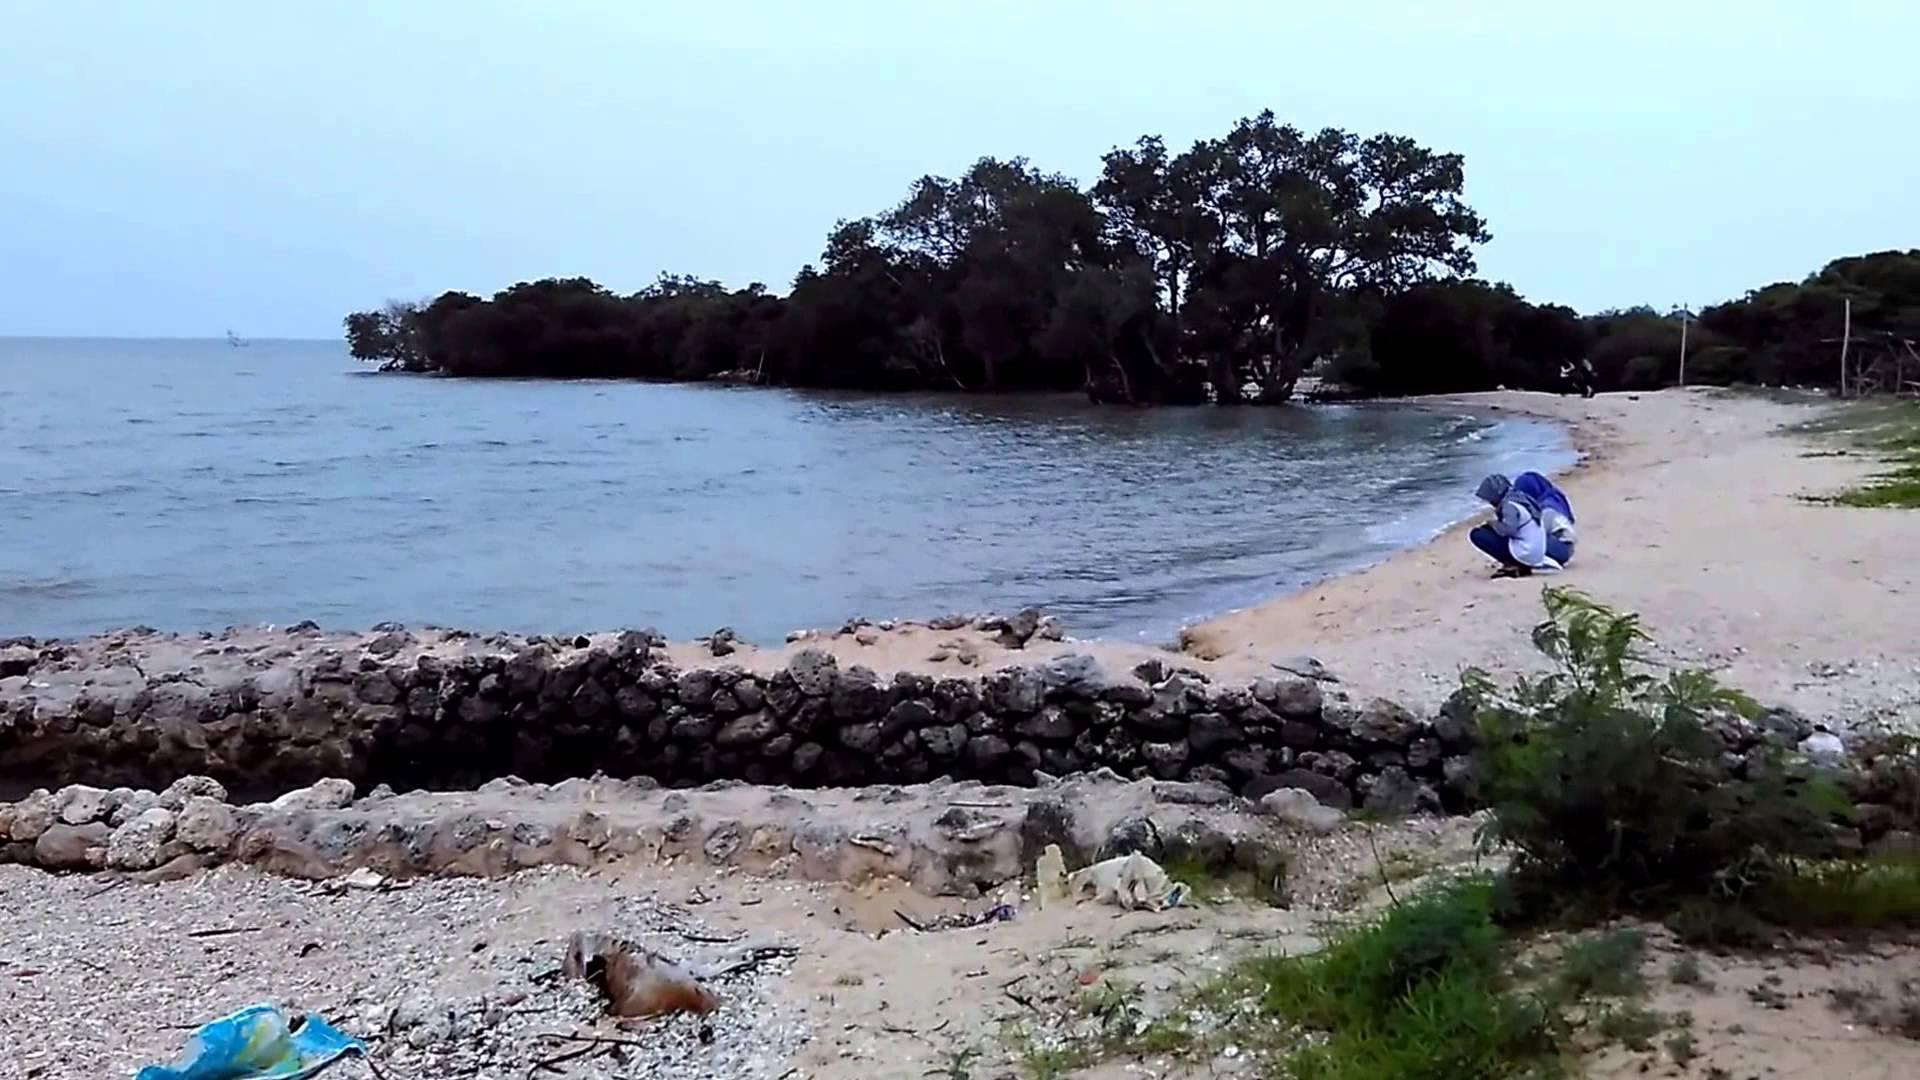 Pantai Kutang Lamongan Pohon Bakau Keunikan Tersendiri Wisata Atas Batu